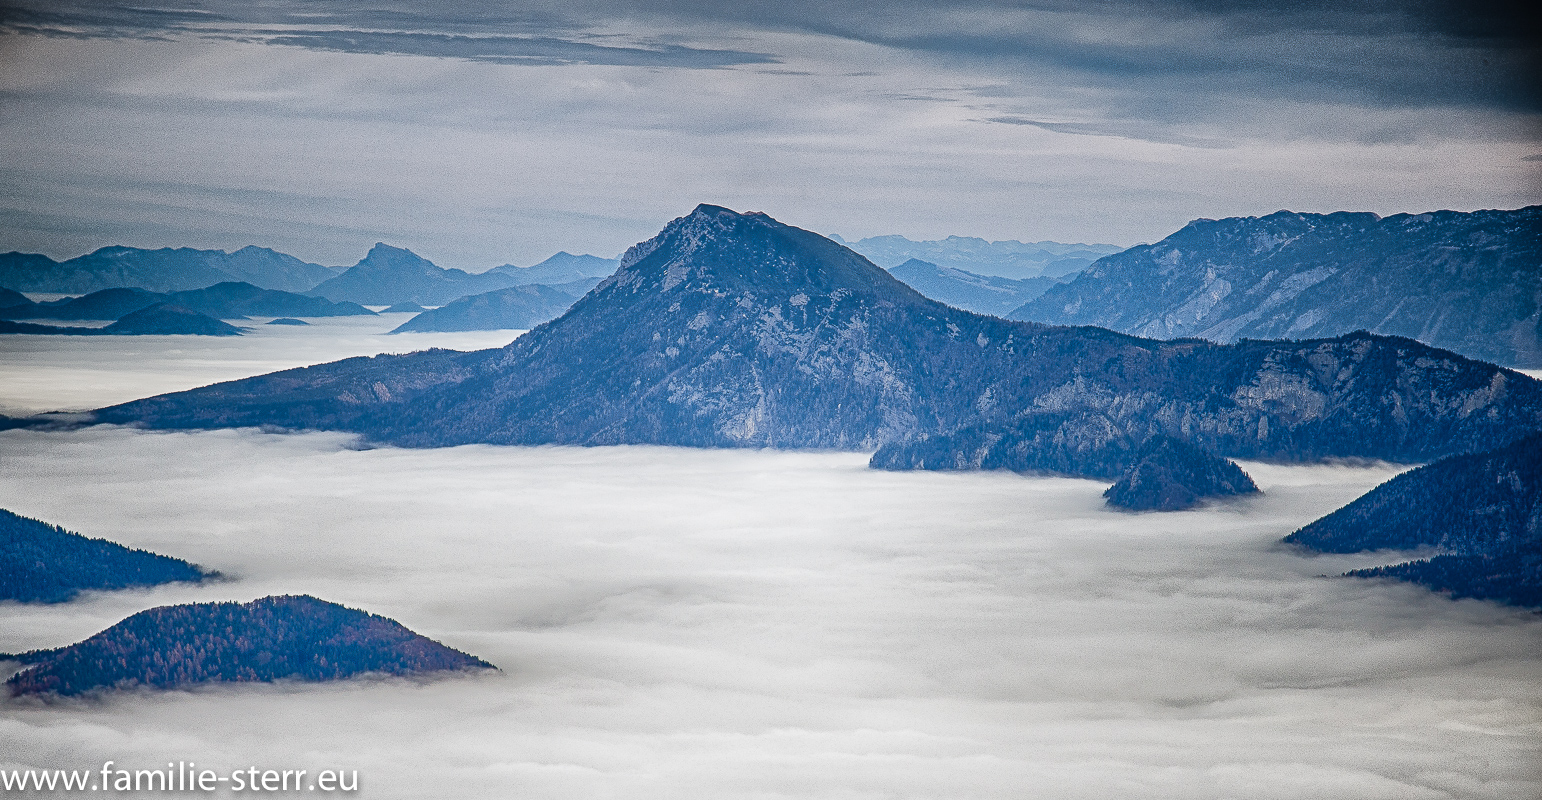 Gipfel ragt aus dem Nebel